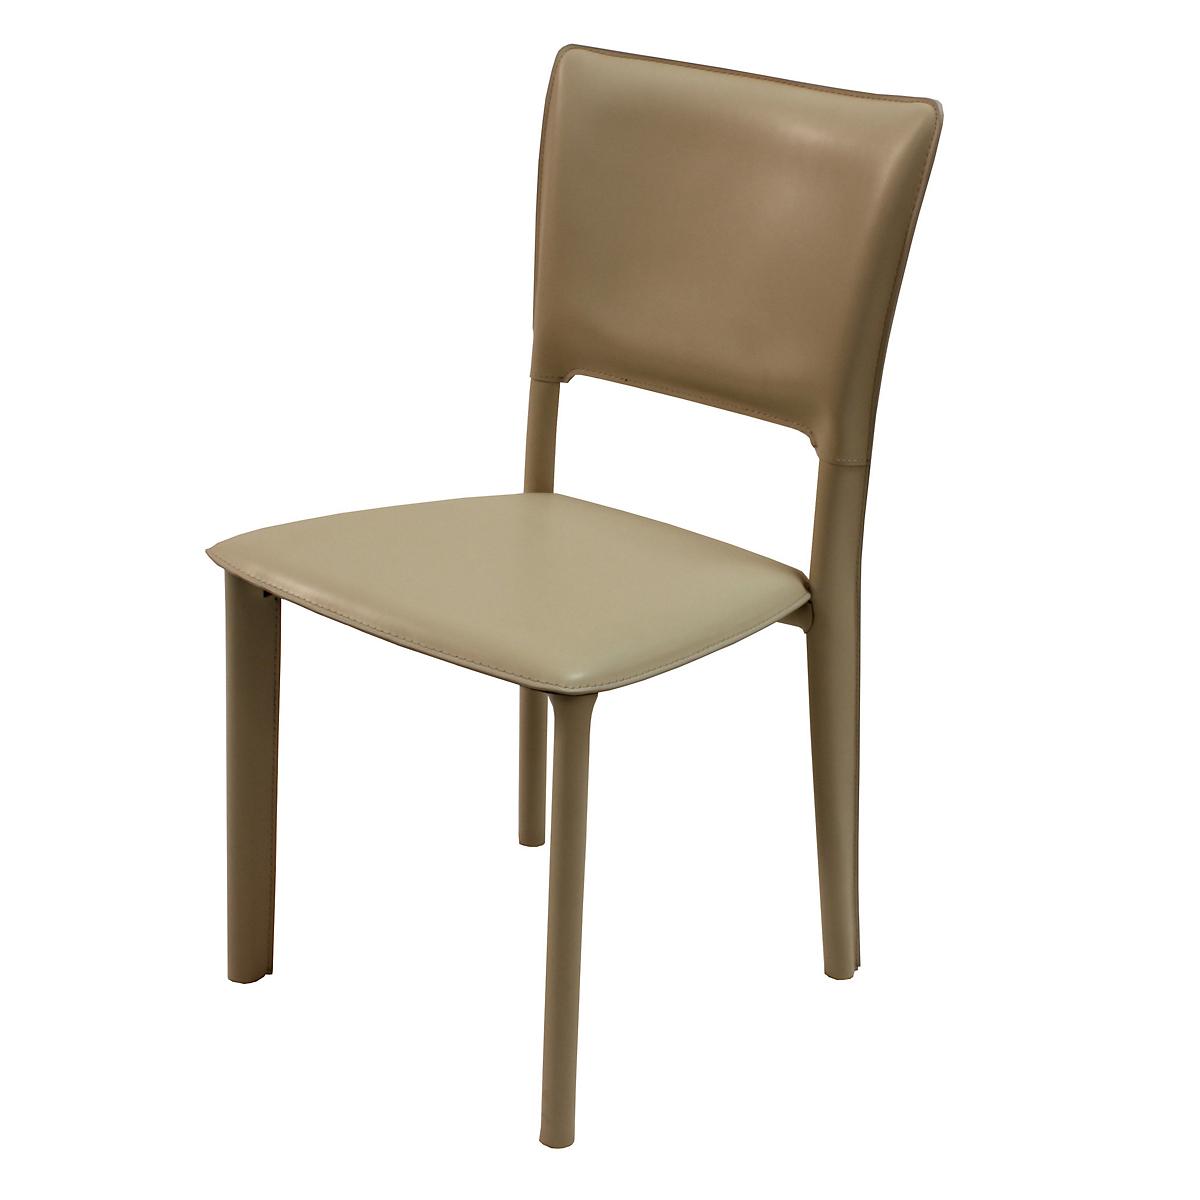 Maria Yee Metro Leather Chair